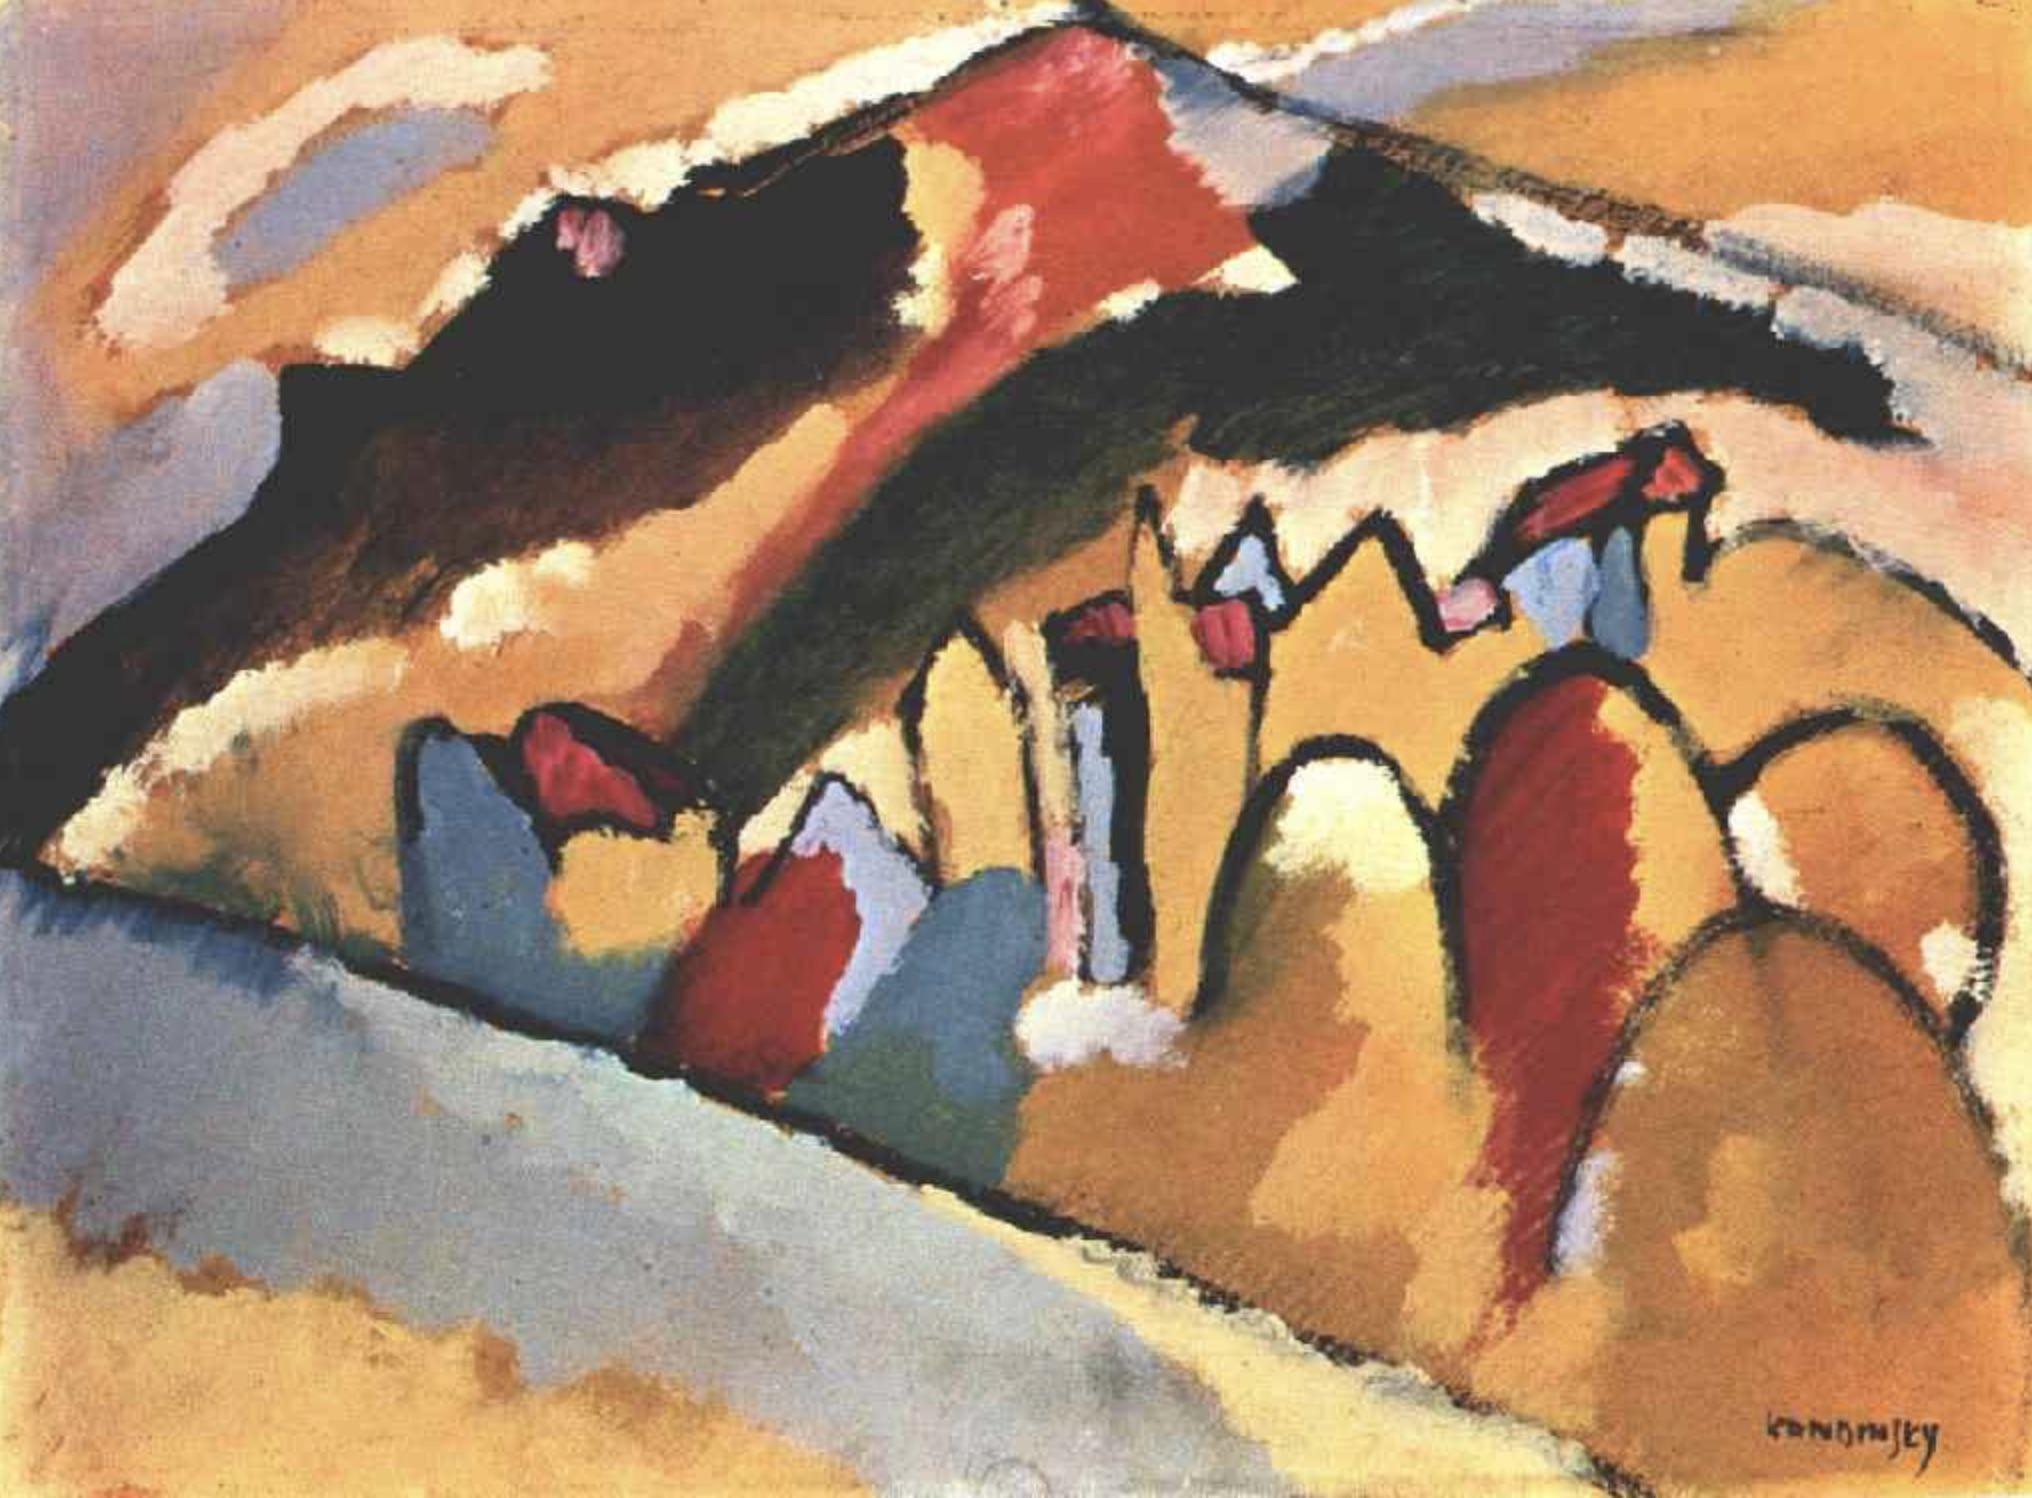 Wassily-Kandinsky-Study-for-Autumn-1909.jpg